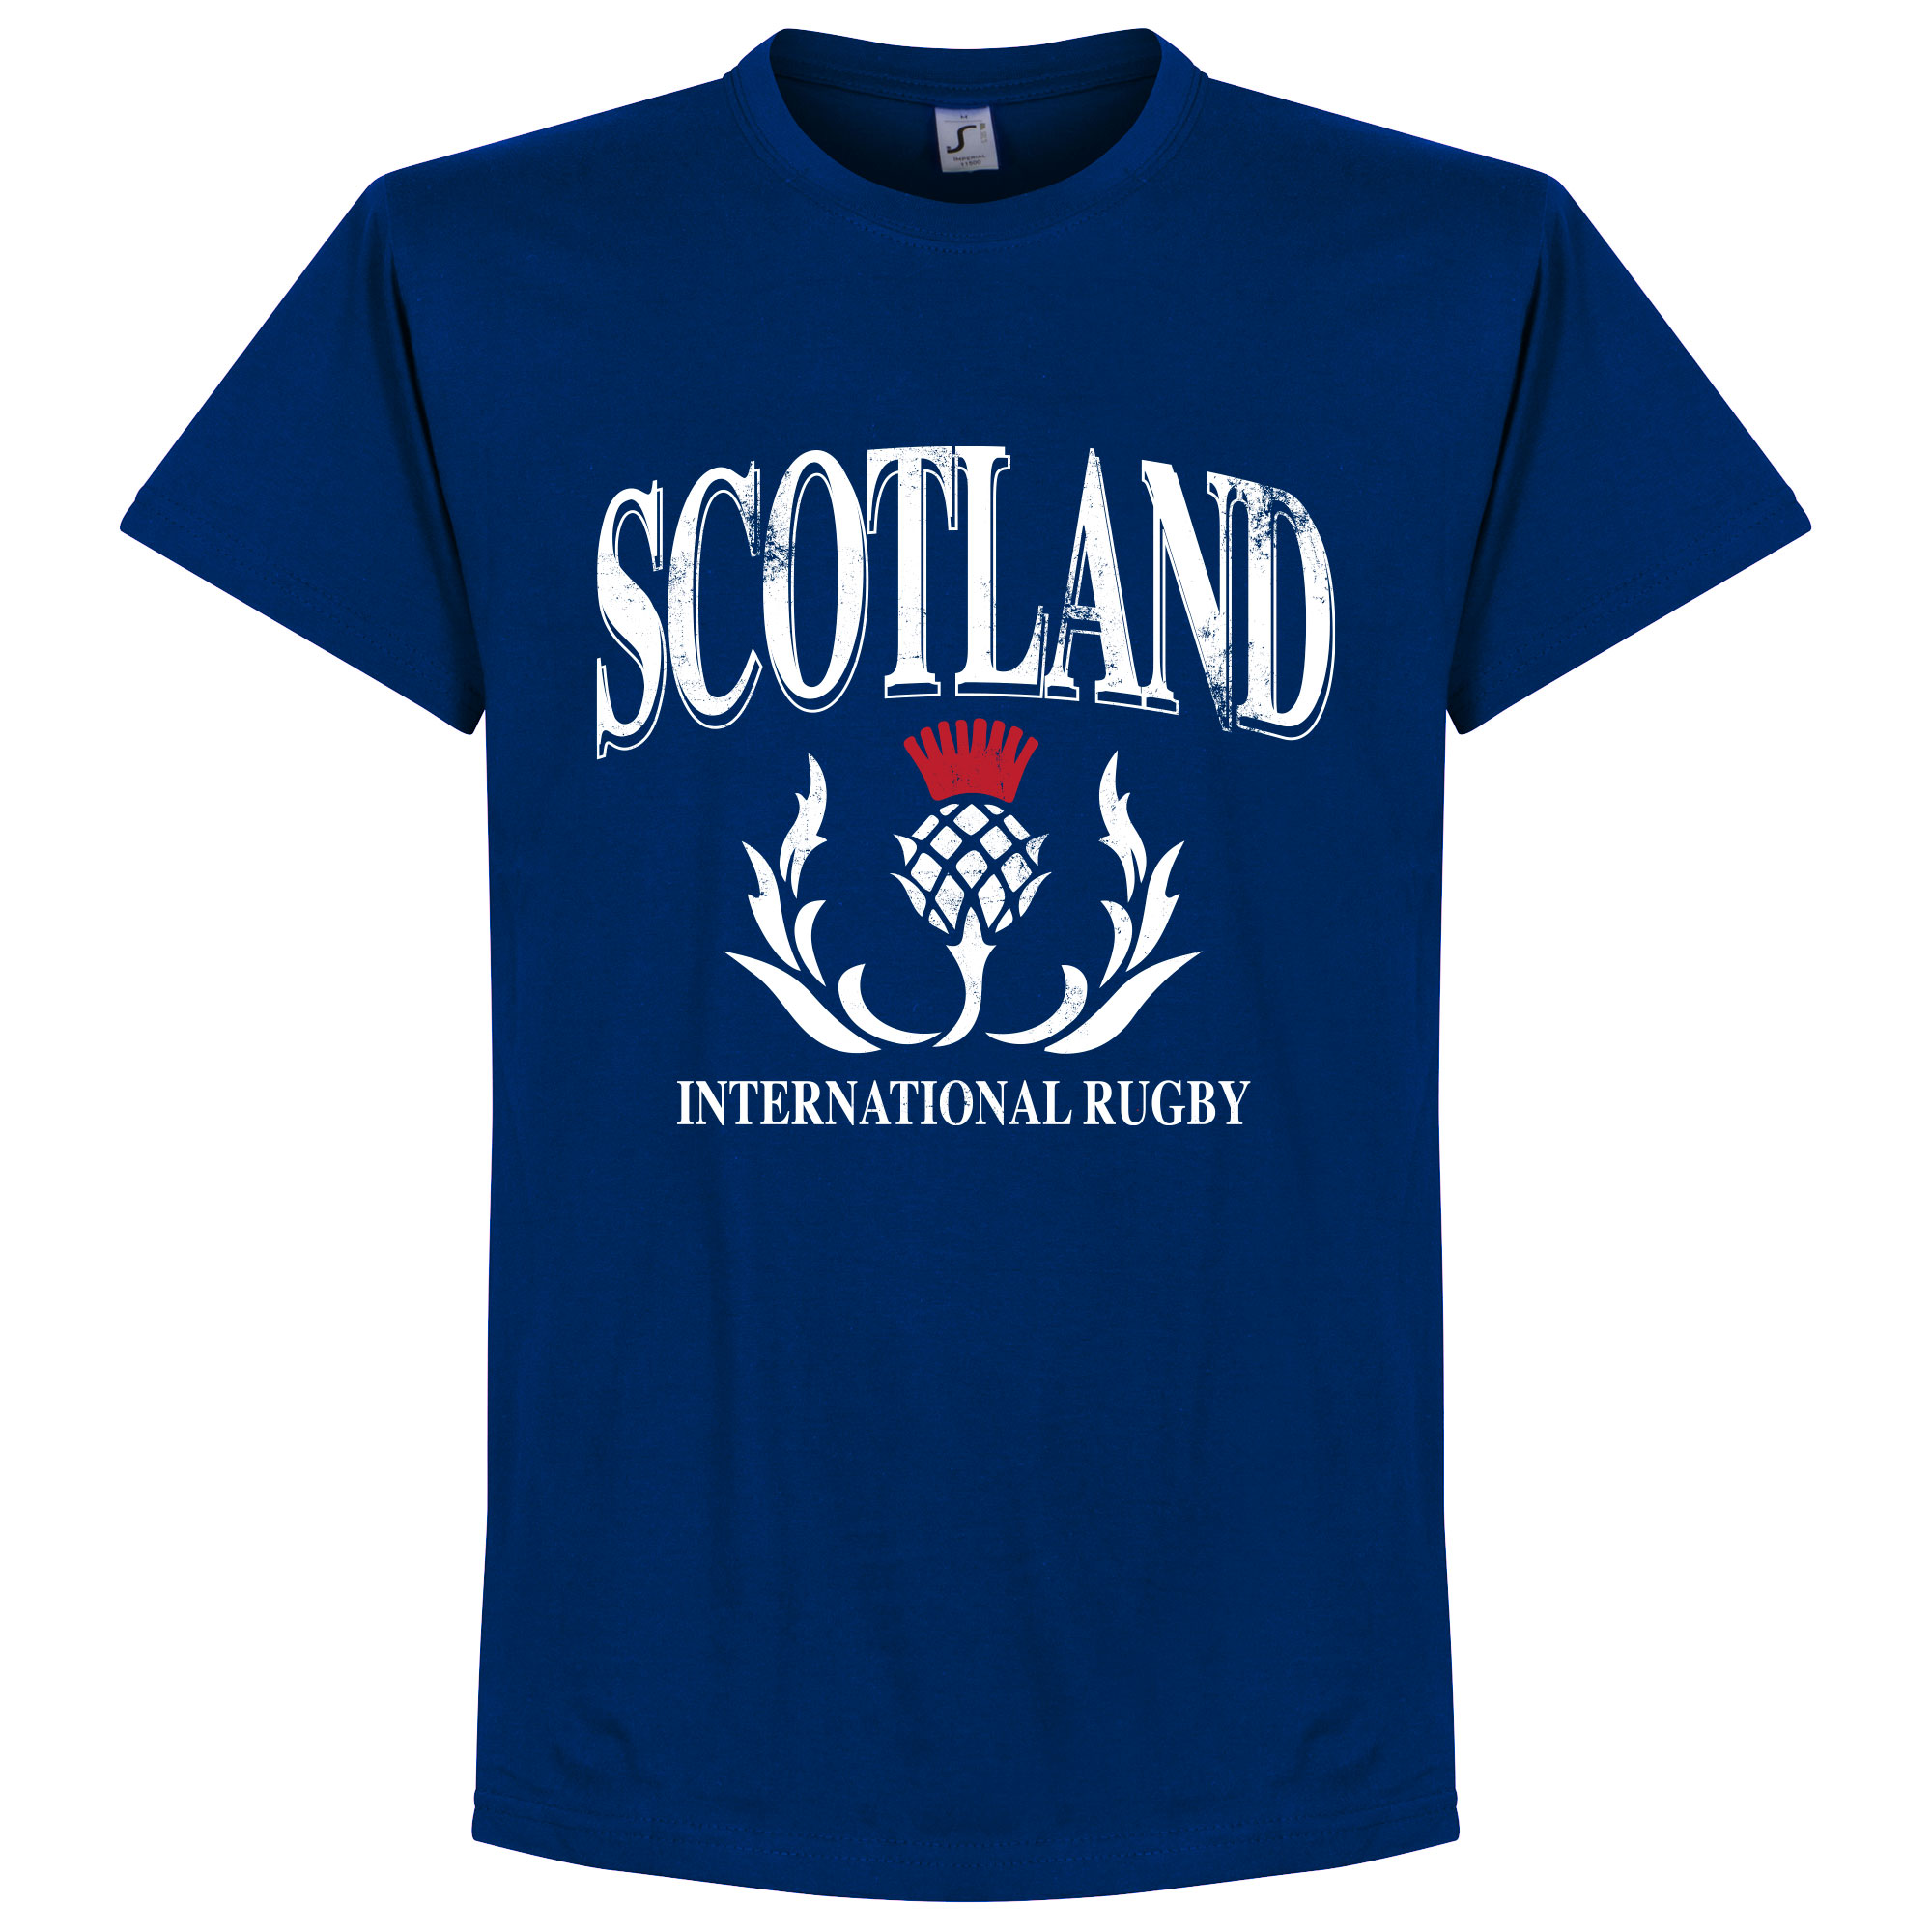 Schotland Rugby T-Shirt - Navy